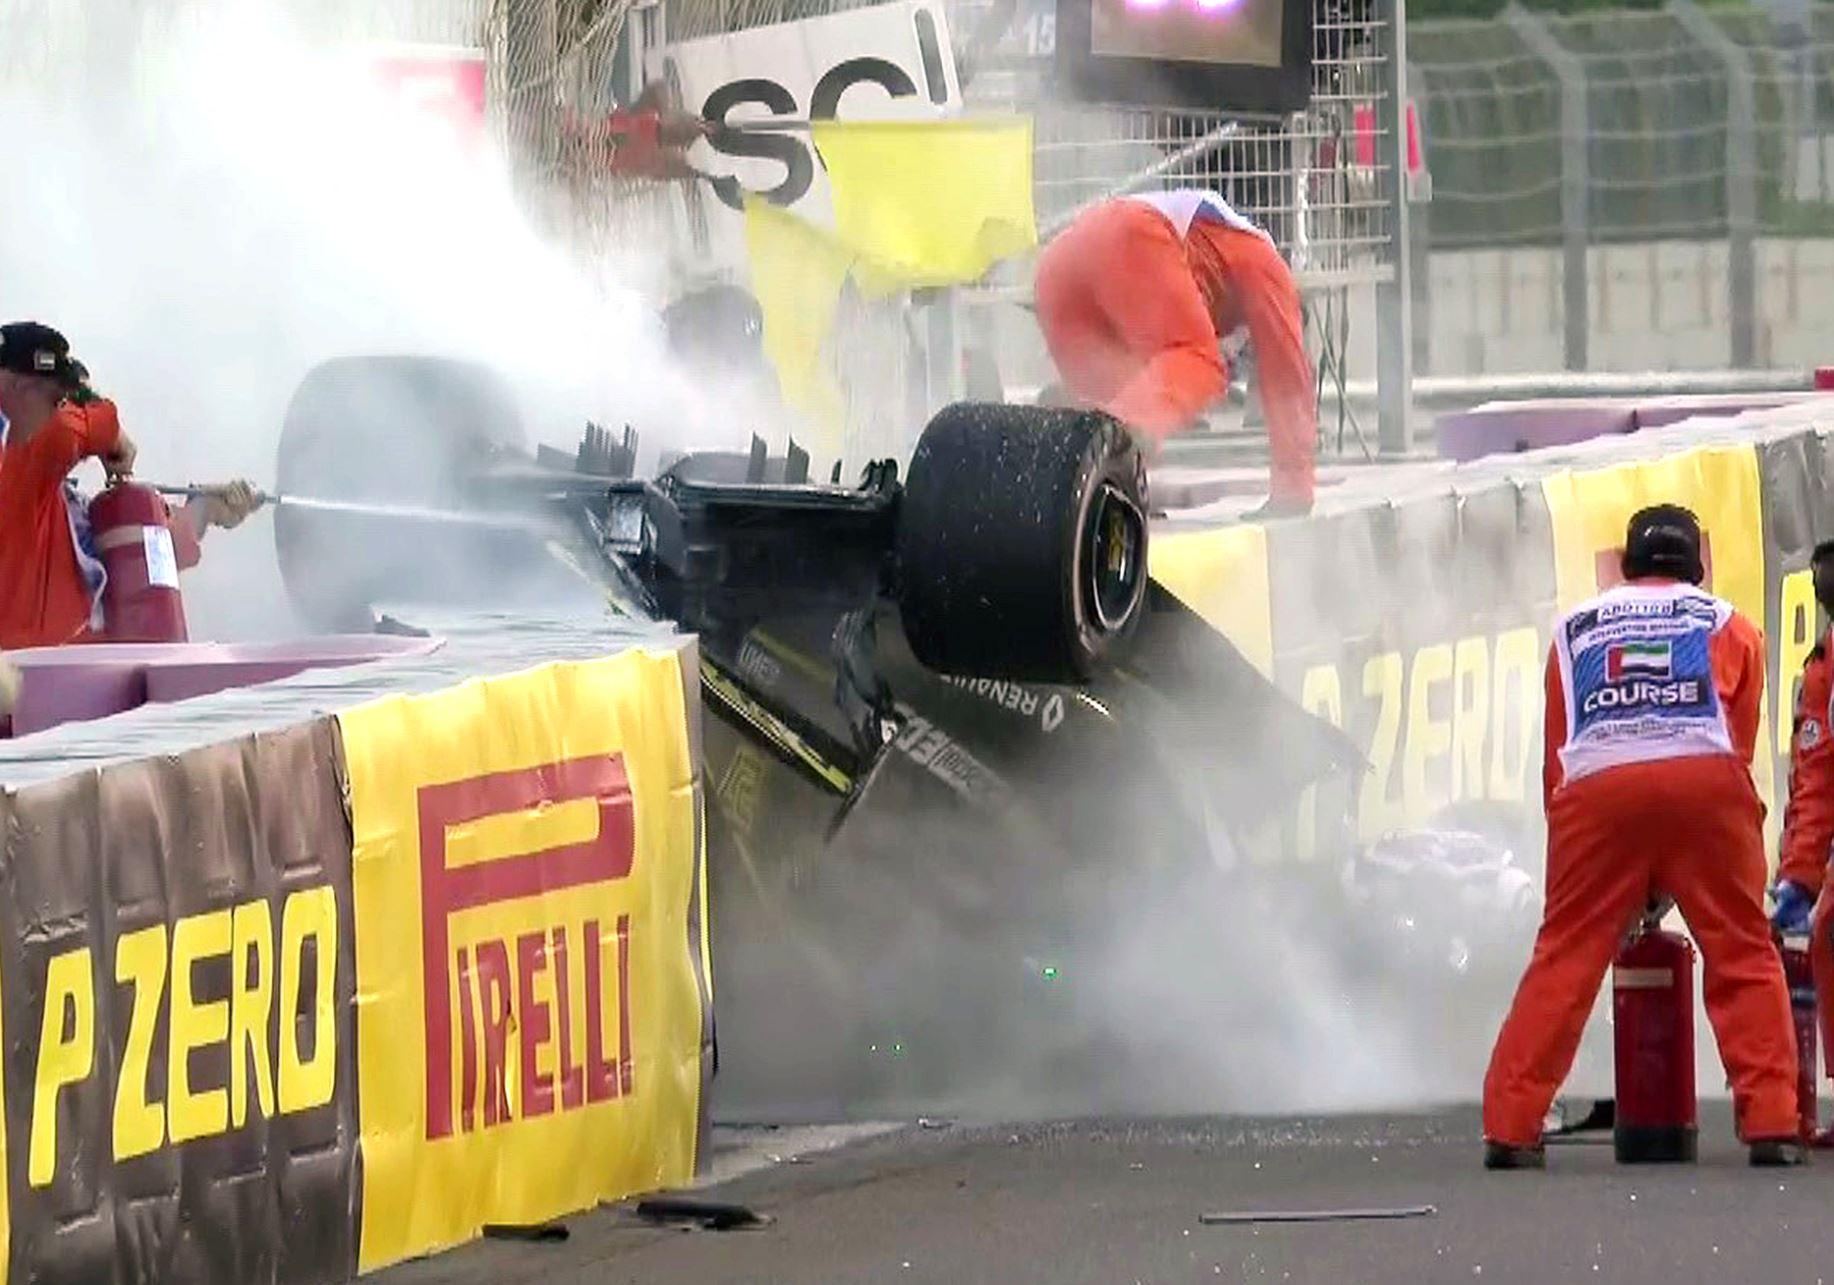 Niko Hulkenberg's car ended up in flames after incident